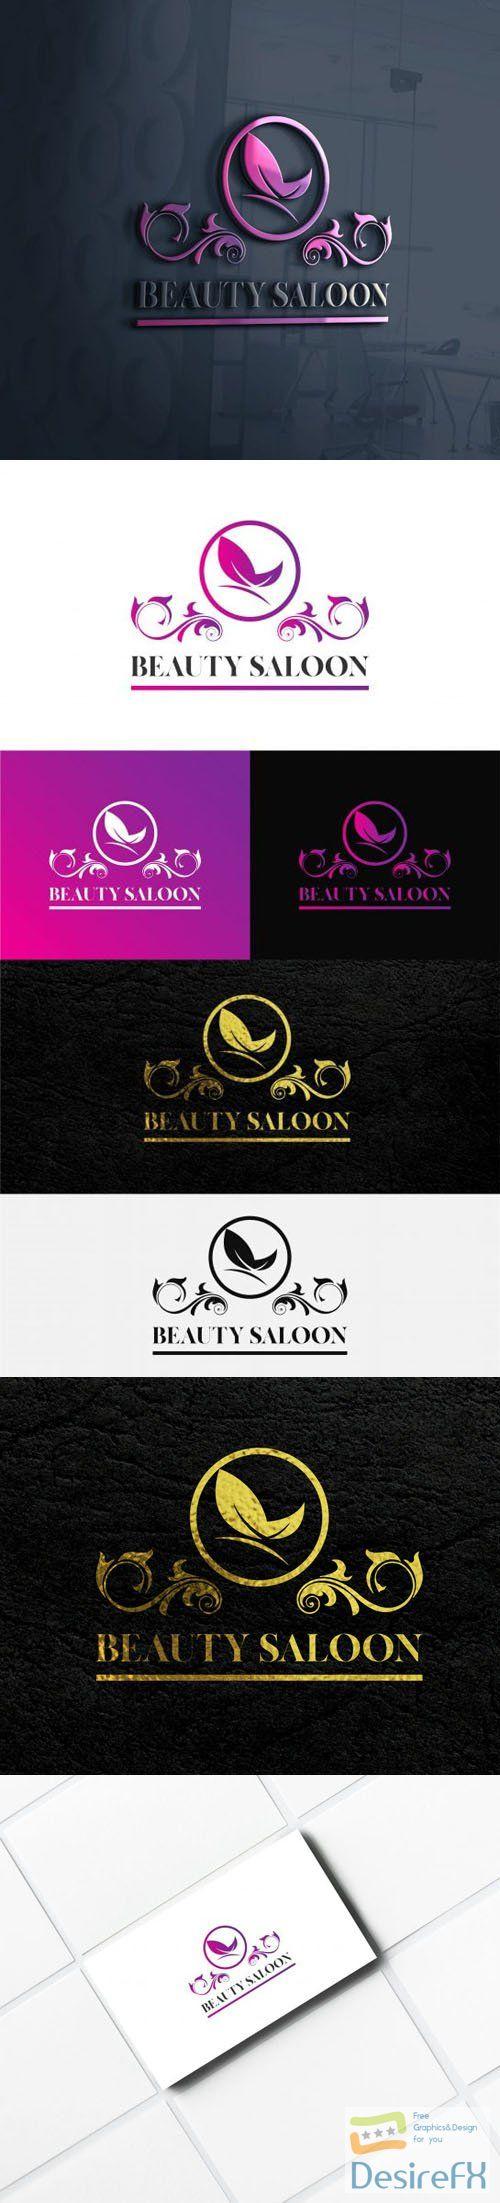 Beauty Saloon Logo Templates for Illustrator